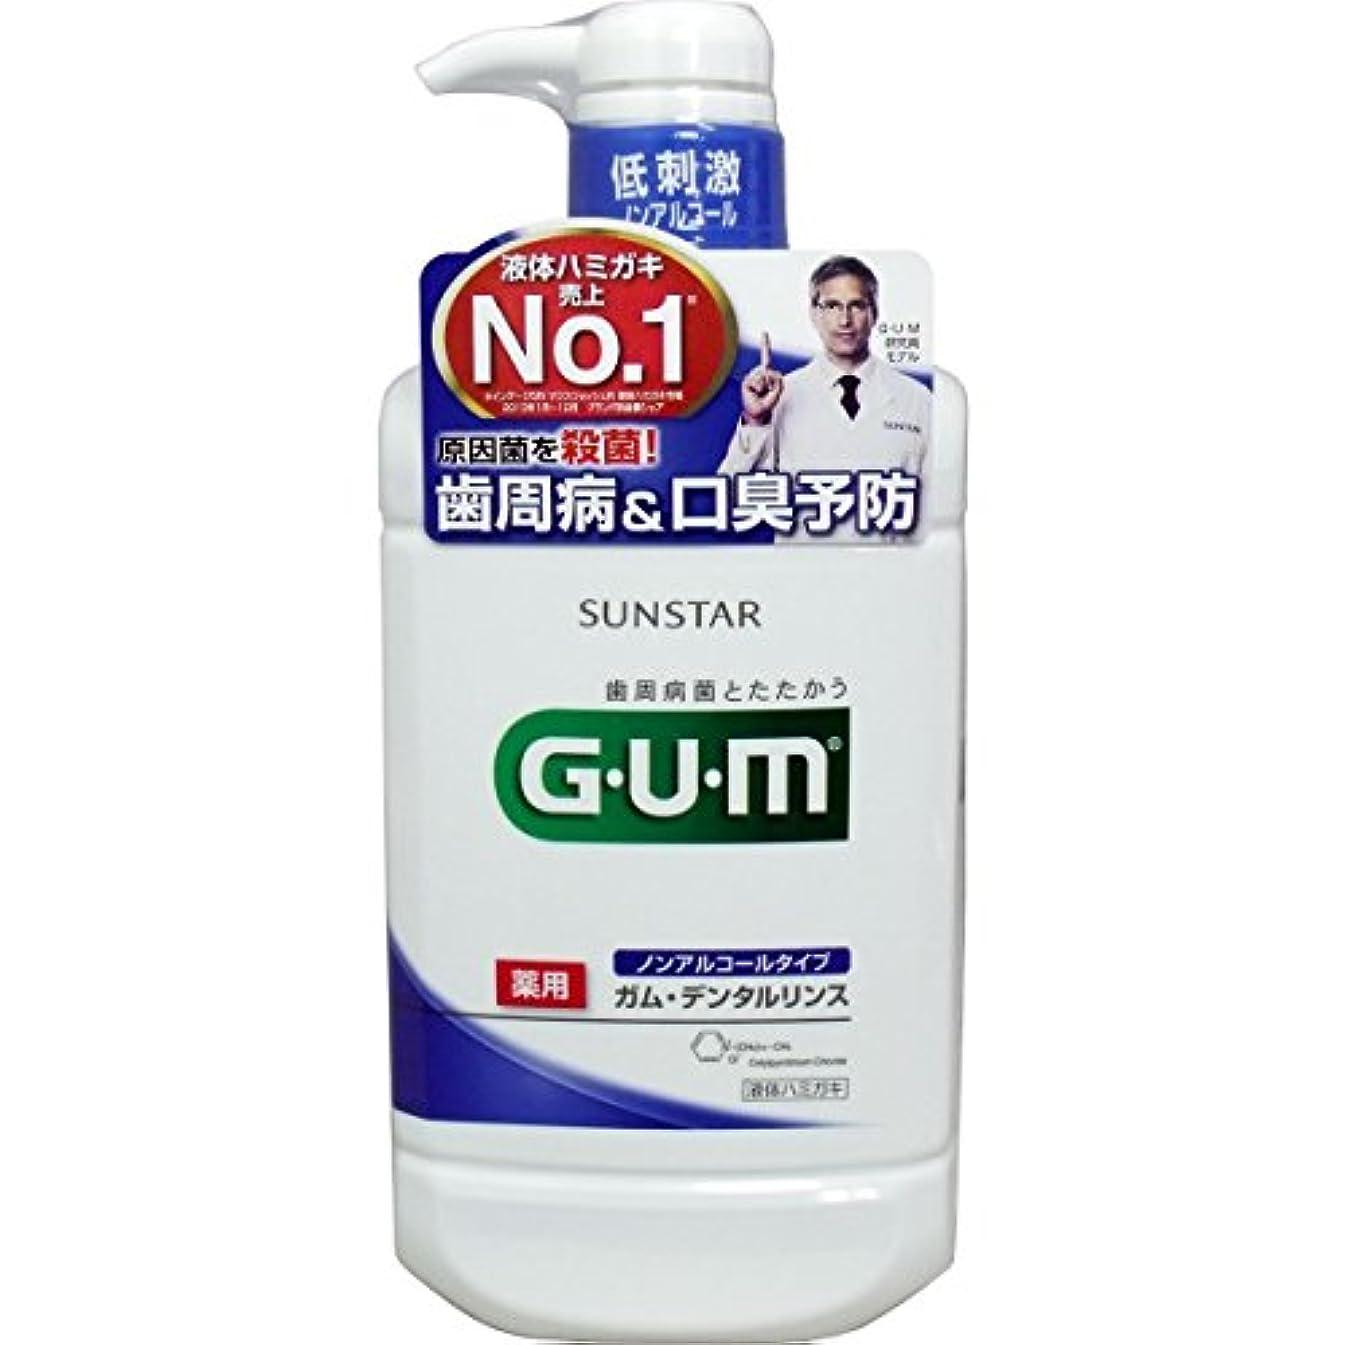 GUM(ガム)?デンタルリンス (ノンアルコールタイプ) 960mL (医薬部外品)